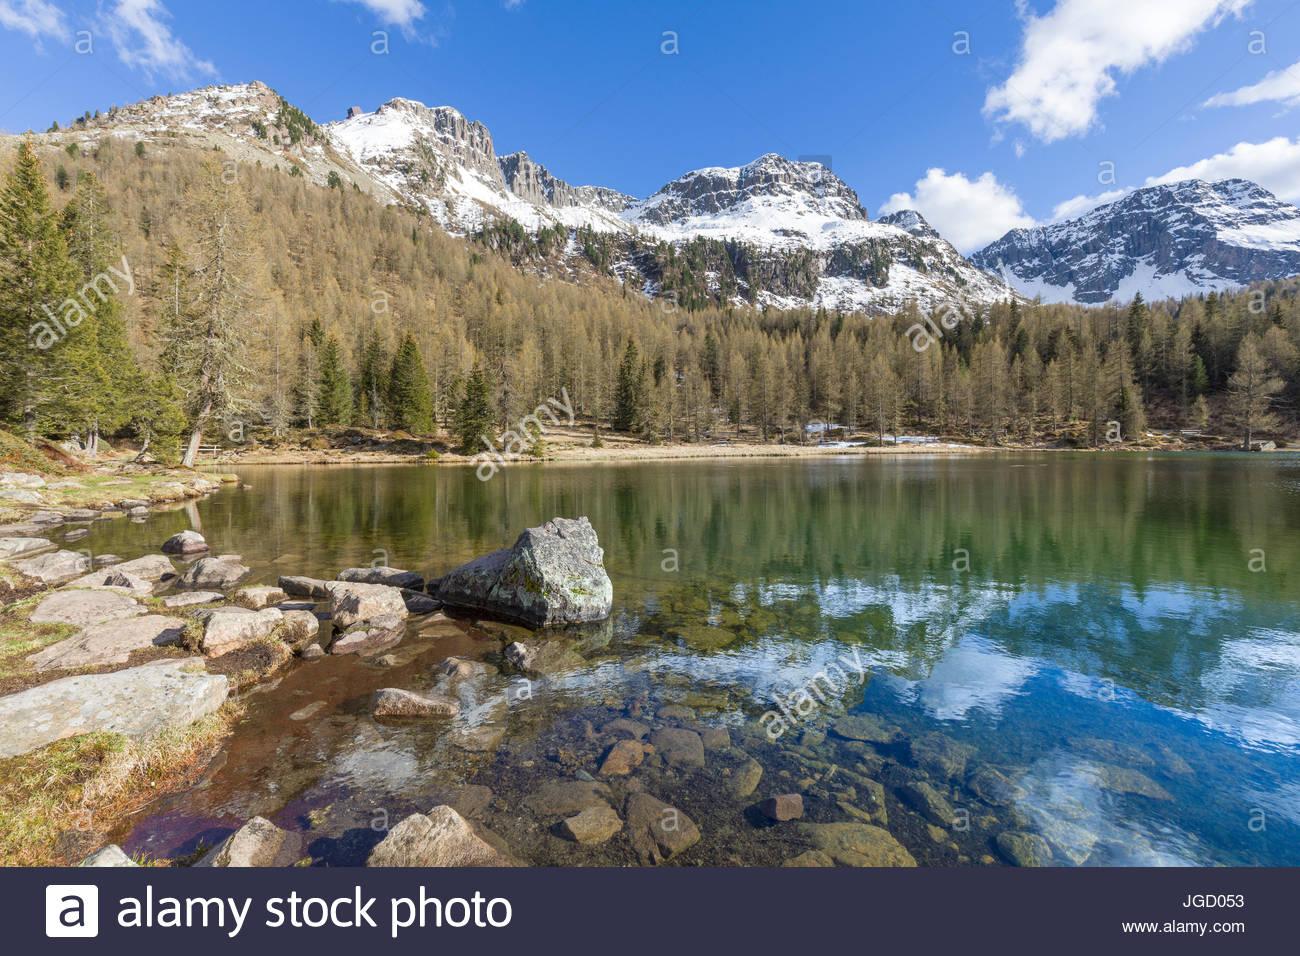 Europe, Italy, Trentino Alto Adige, Moena, Dolomites, the  alpine lake of San Pellegrino surrounded by a forest Stock Photo